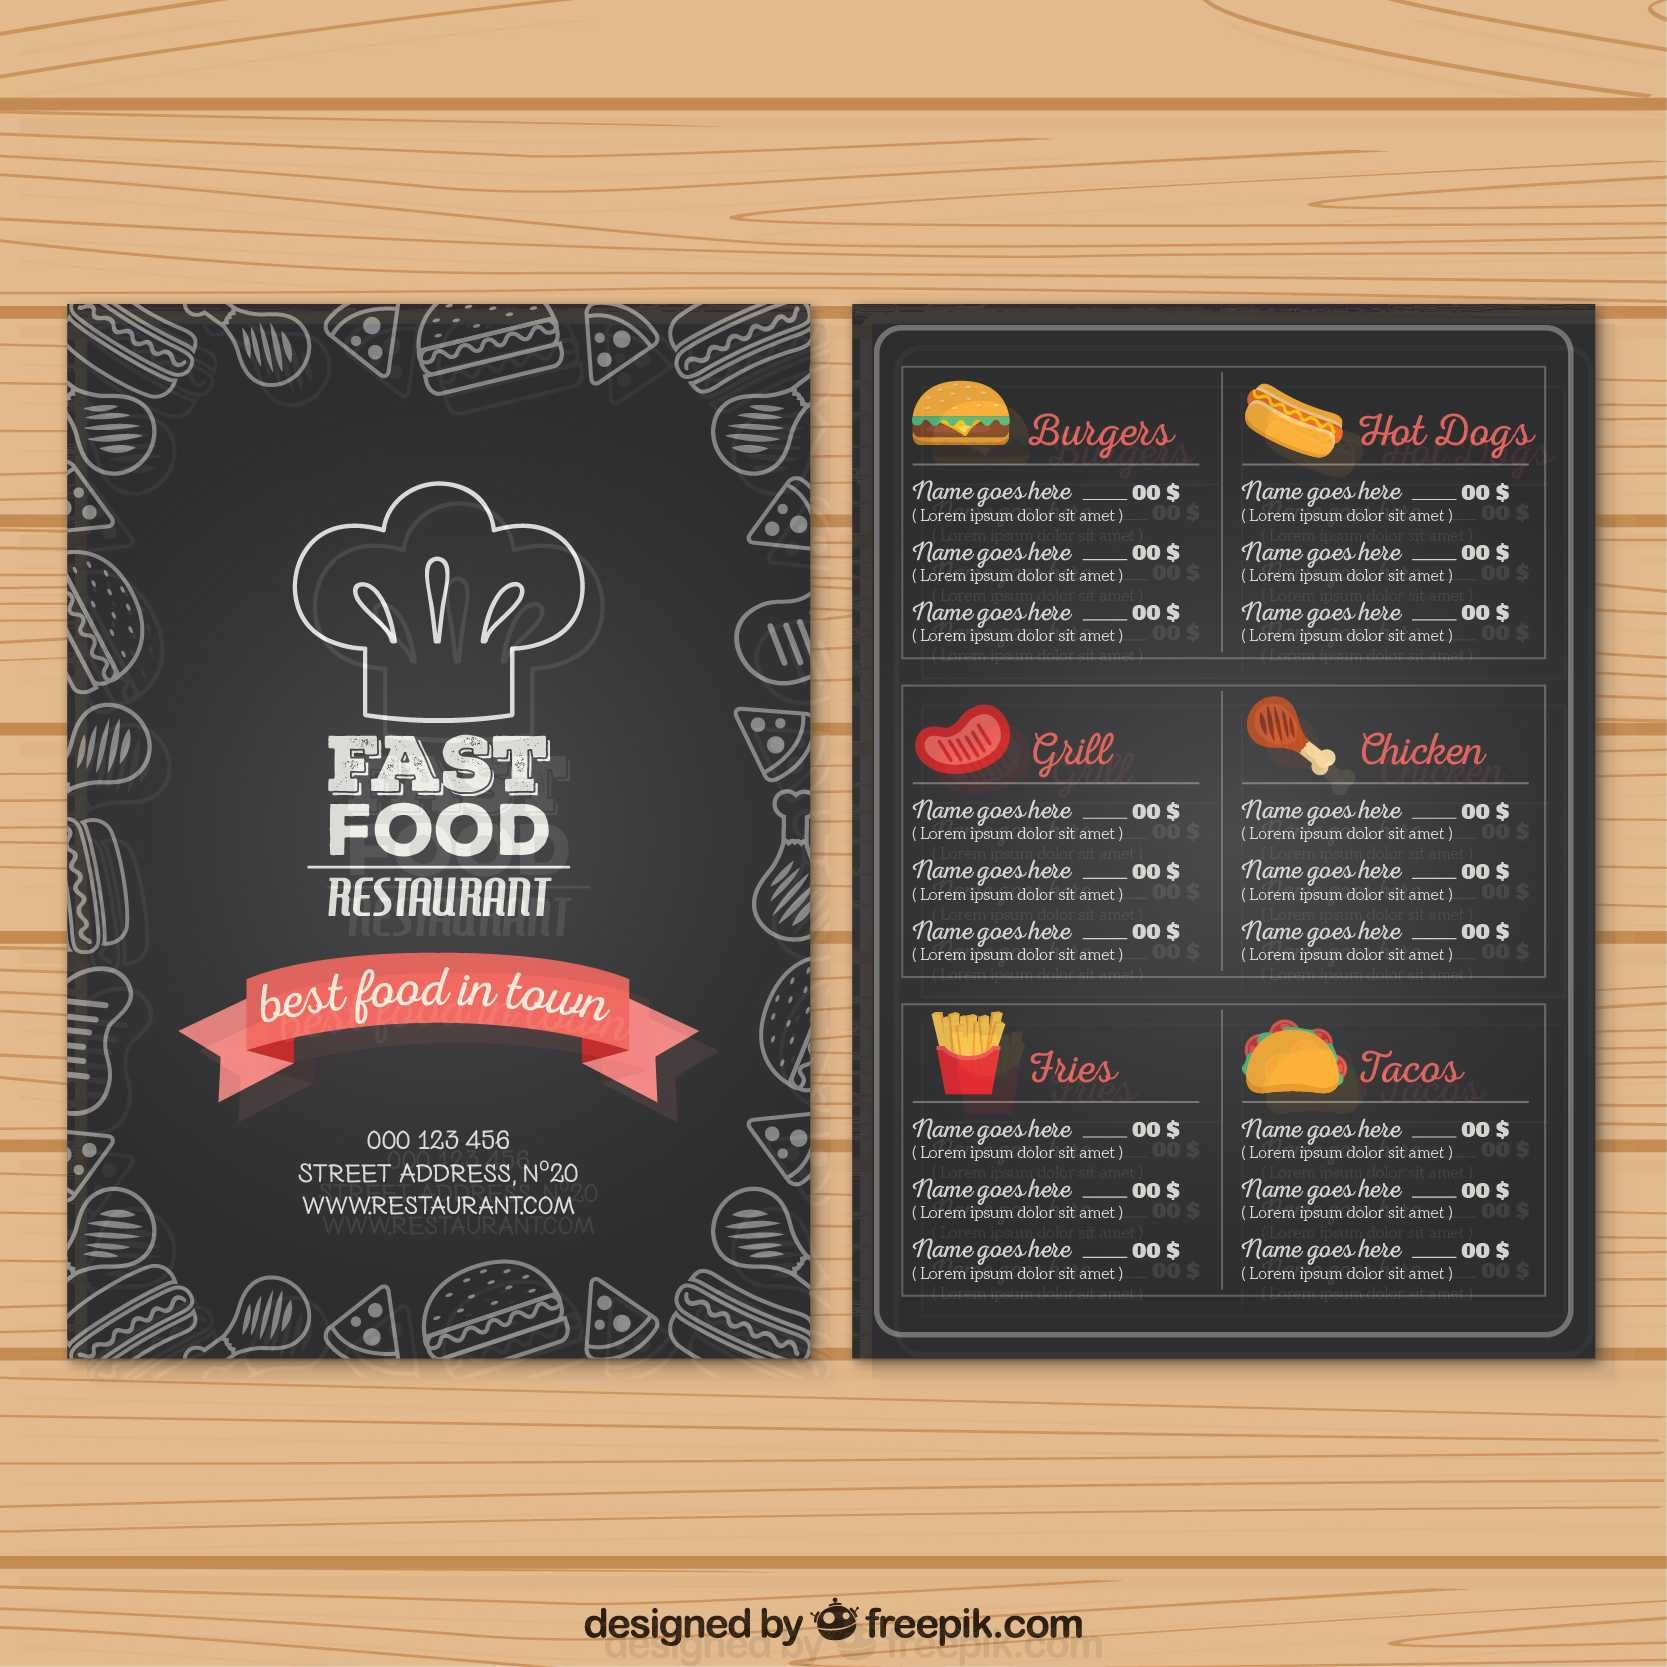 Hand Drawn Fast Food Menu In Blackboard Style Free Fast Food Menu Food Truck Menu Food Menu Design